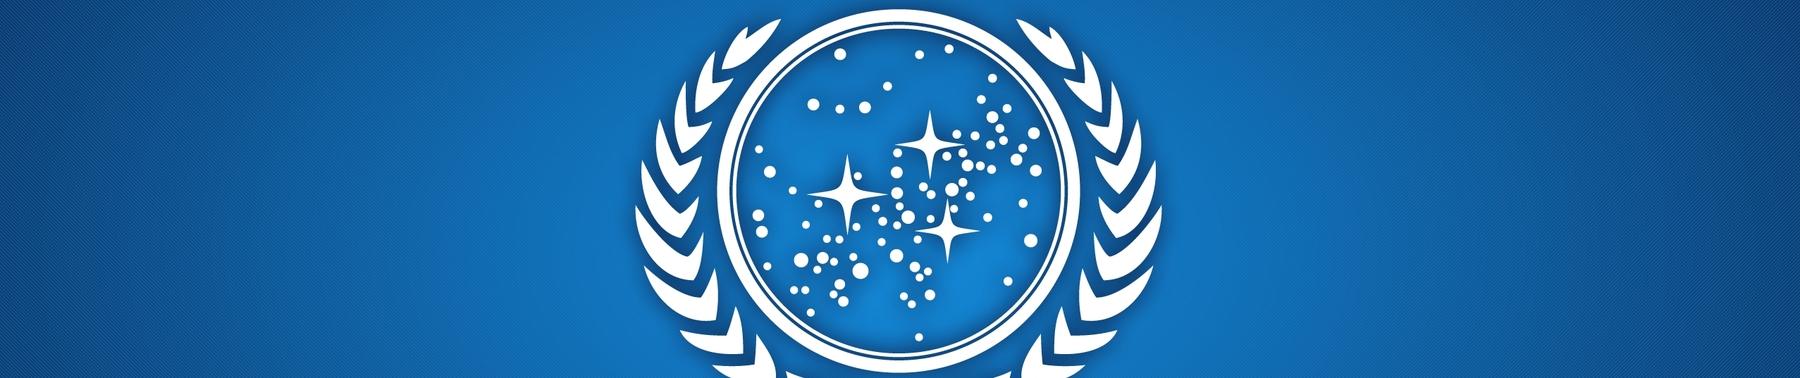 Star Trek - Memory Alpha Wiki | Kaggle